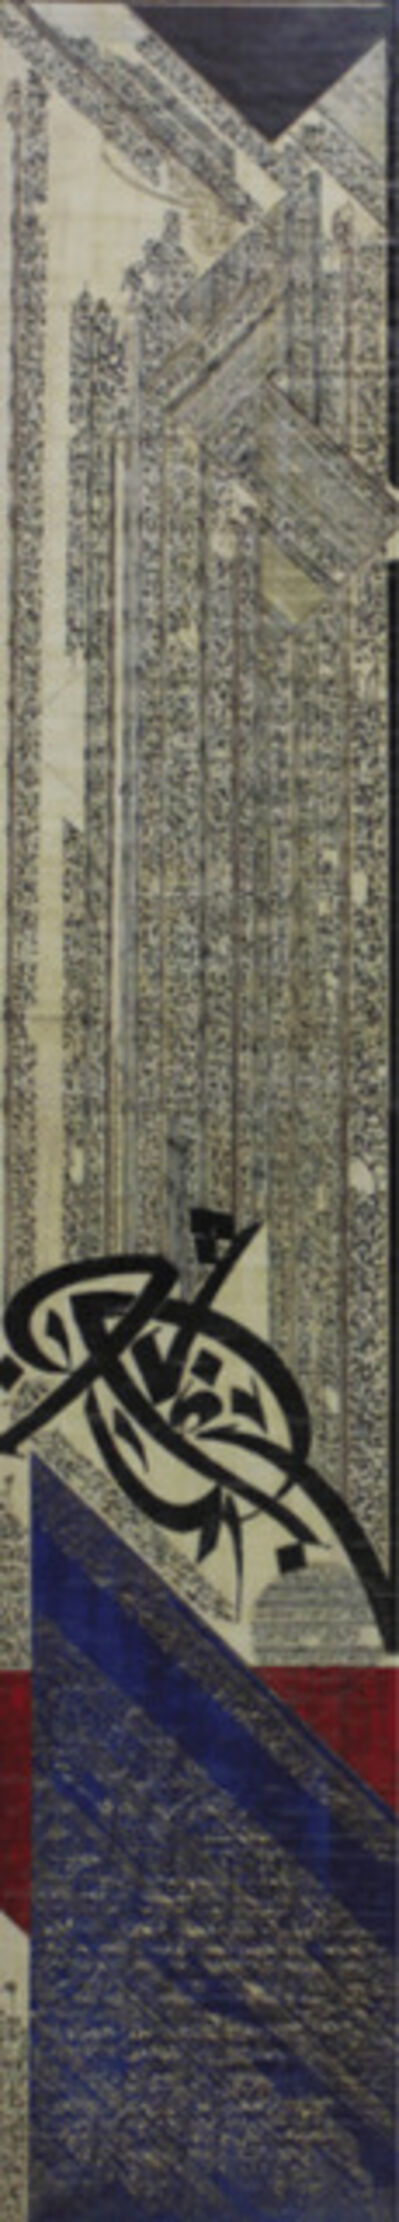 Nja Mahdaoui, 'Untitled', ca. 2004